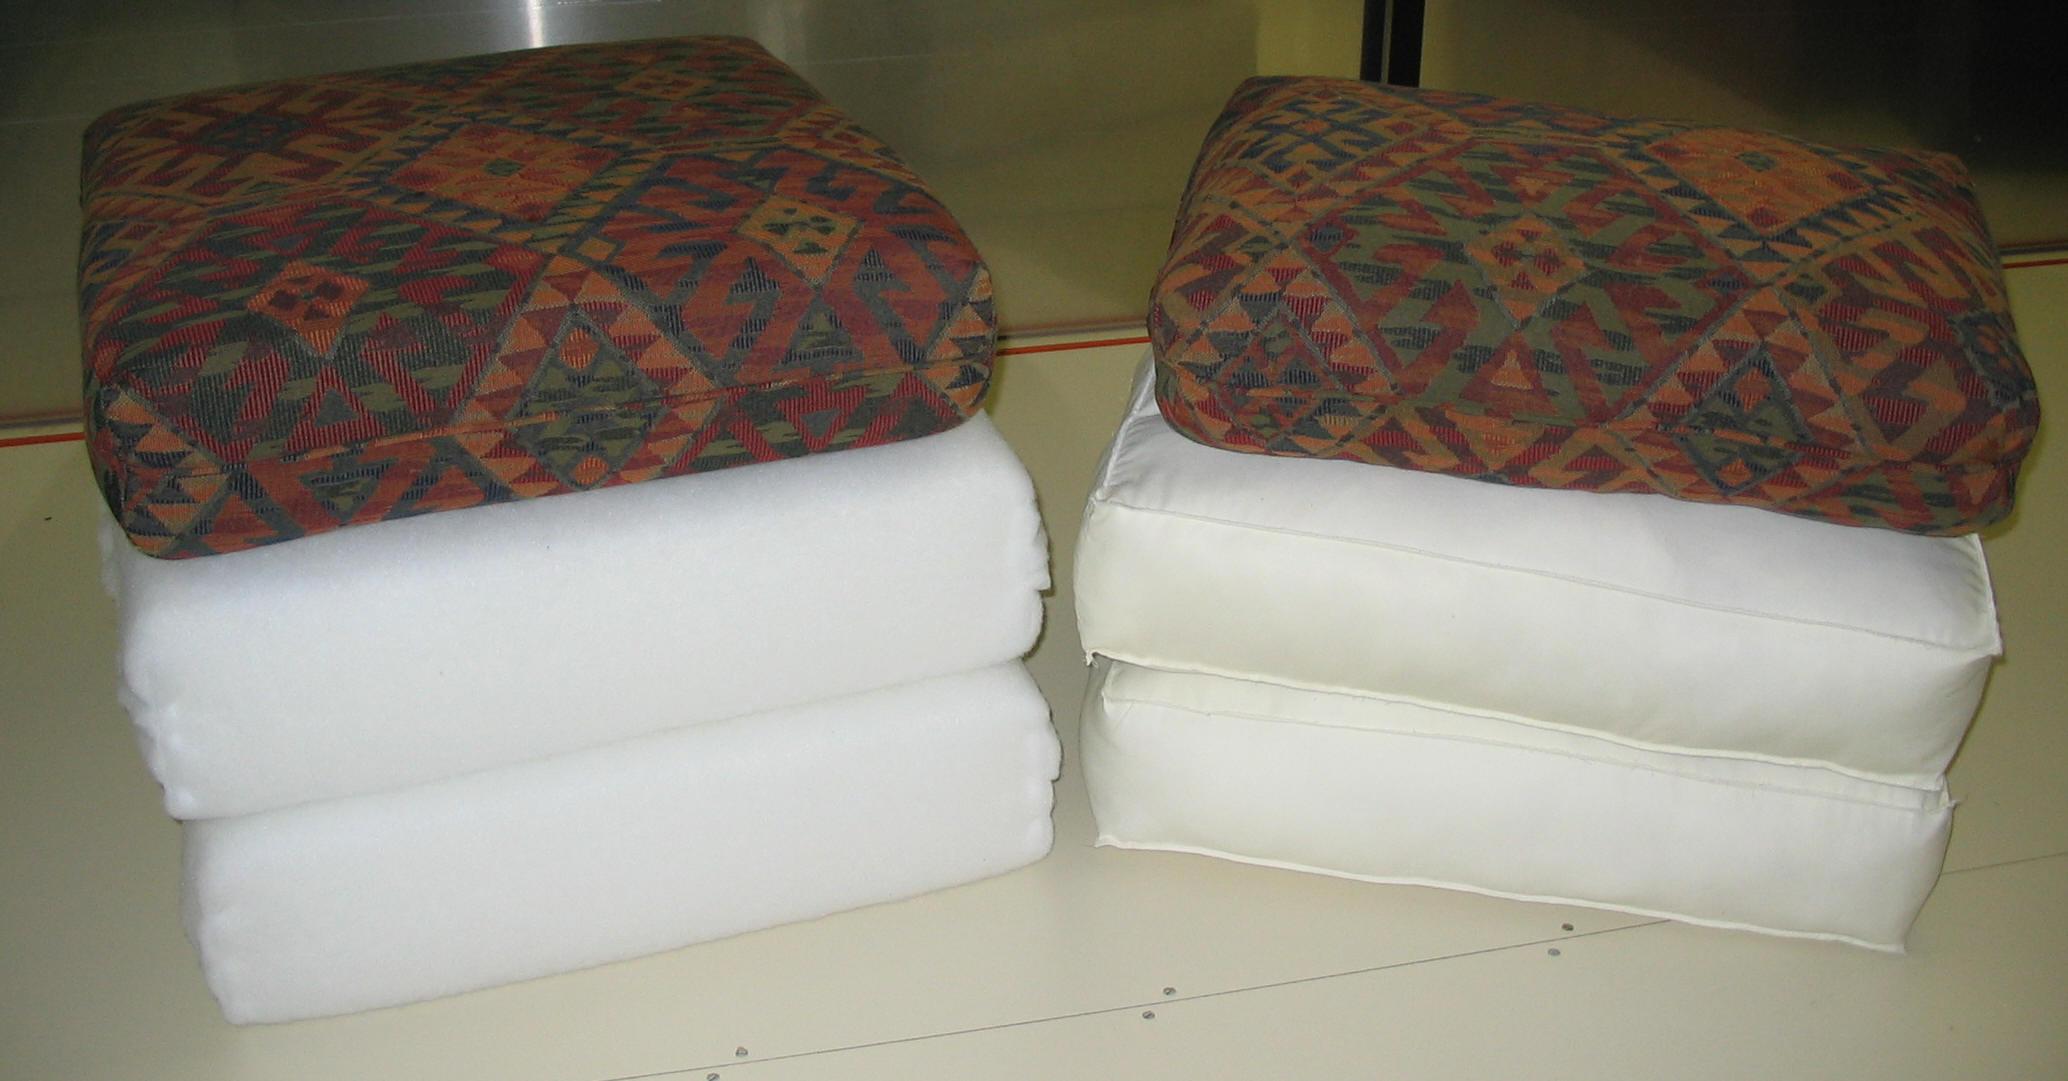 Cushions1 Customfoam Small Backwedge2 Neoprene Coloredfoamjpg Eggcreattopper1 Sofa Cushion Replacement Custom Cut Foam